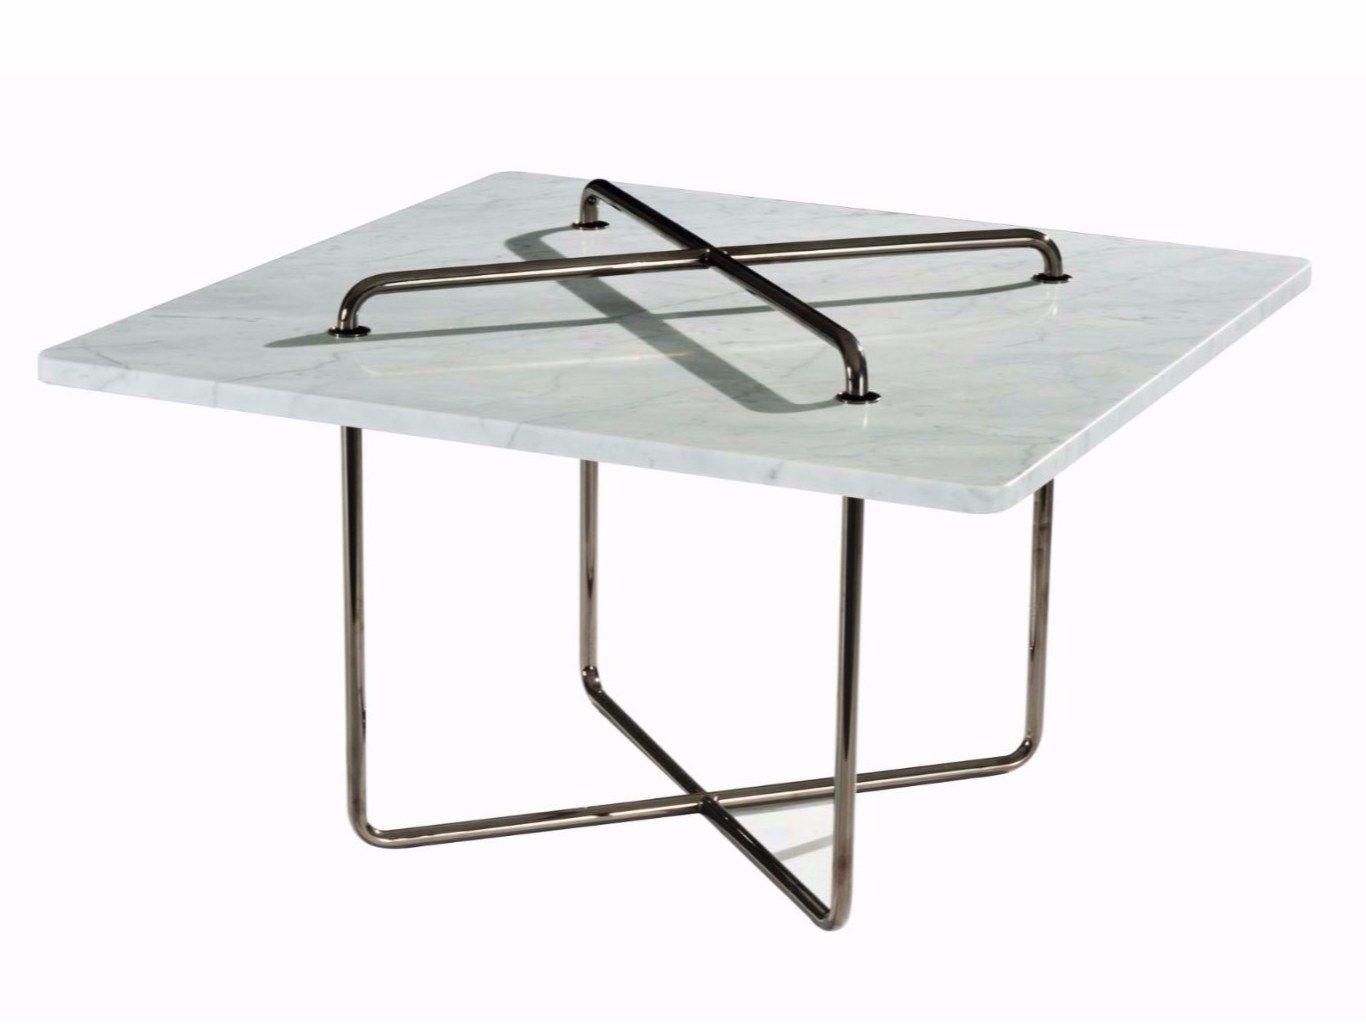 Table basse carr e en marbre button by roche bobois design - Table marbre roche bobois ...